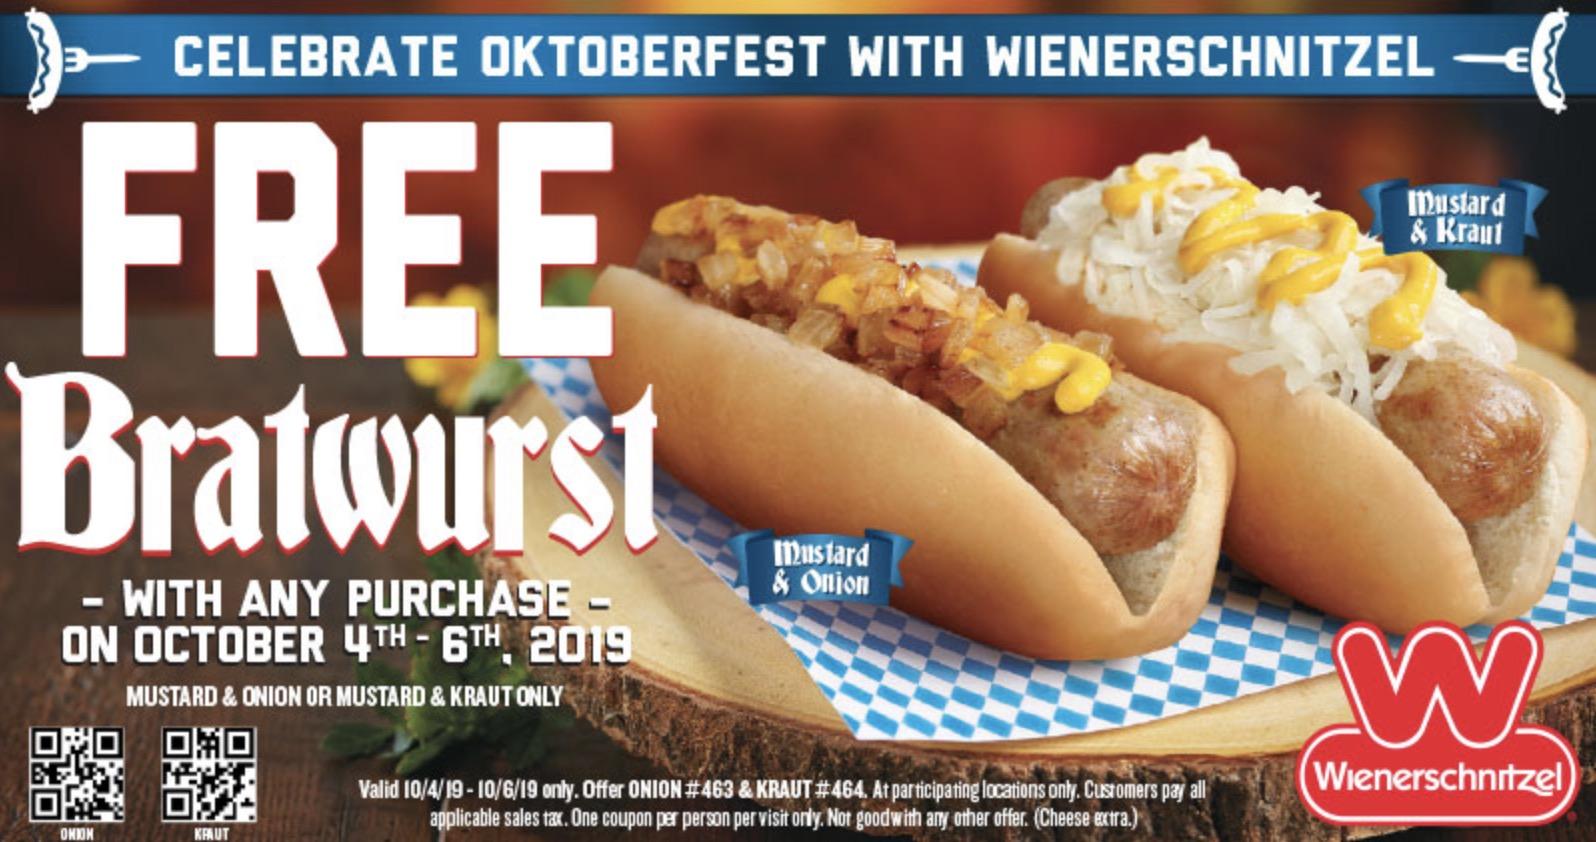 FREE Bratwurst at Wienerschnitzel Coupon